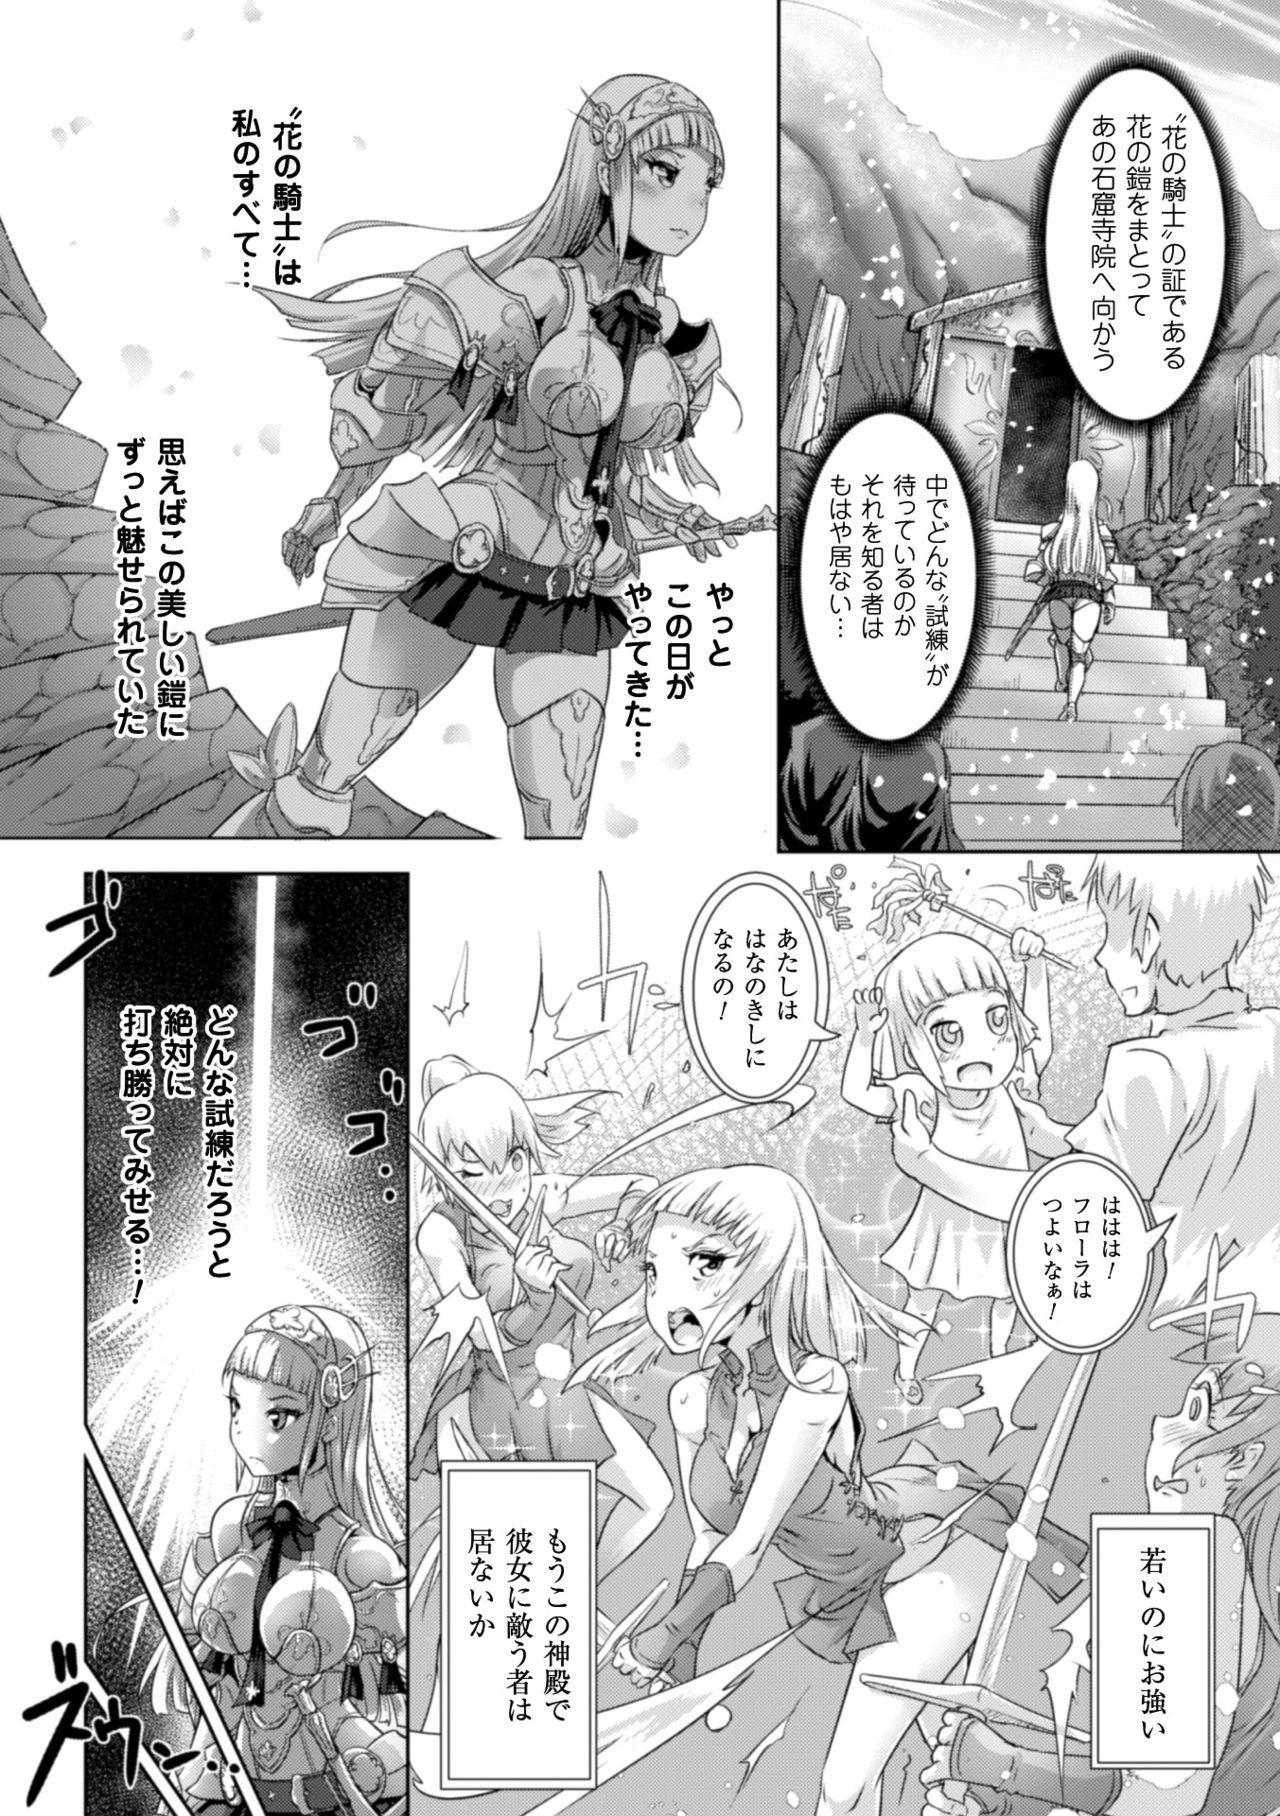 2D Comic Magazine Shokushu Yoroi ni Zenshin o Okasare Mugen Zecchou! Vol. 5 5